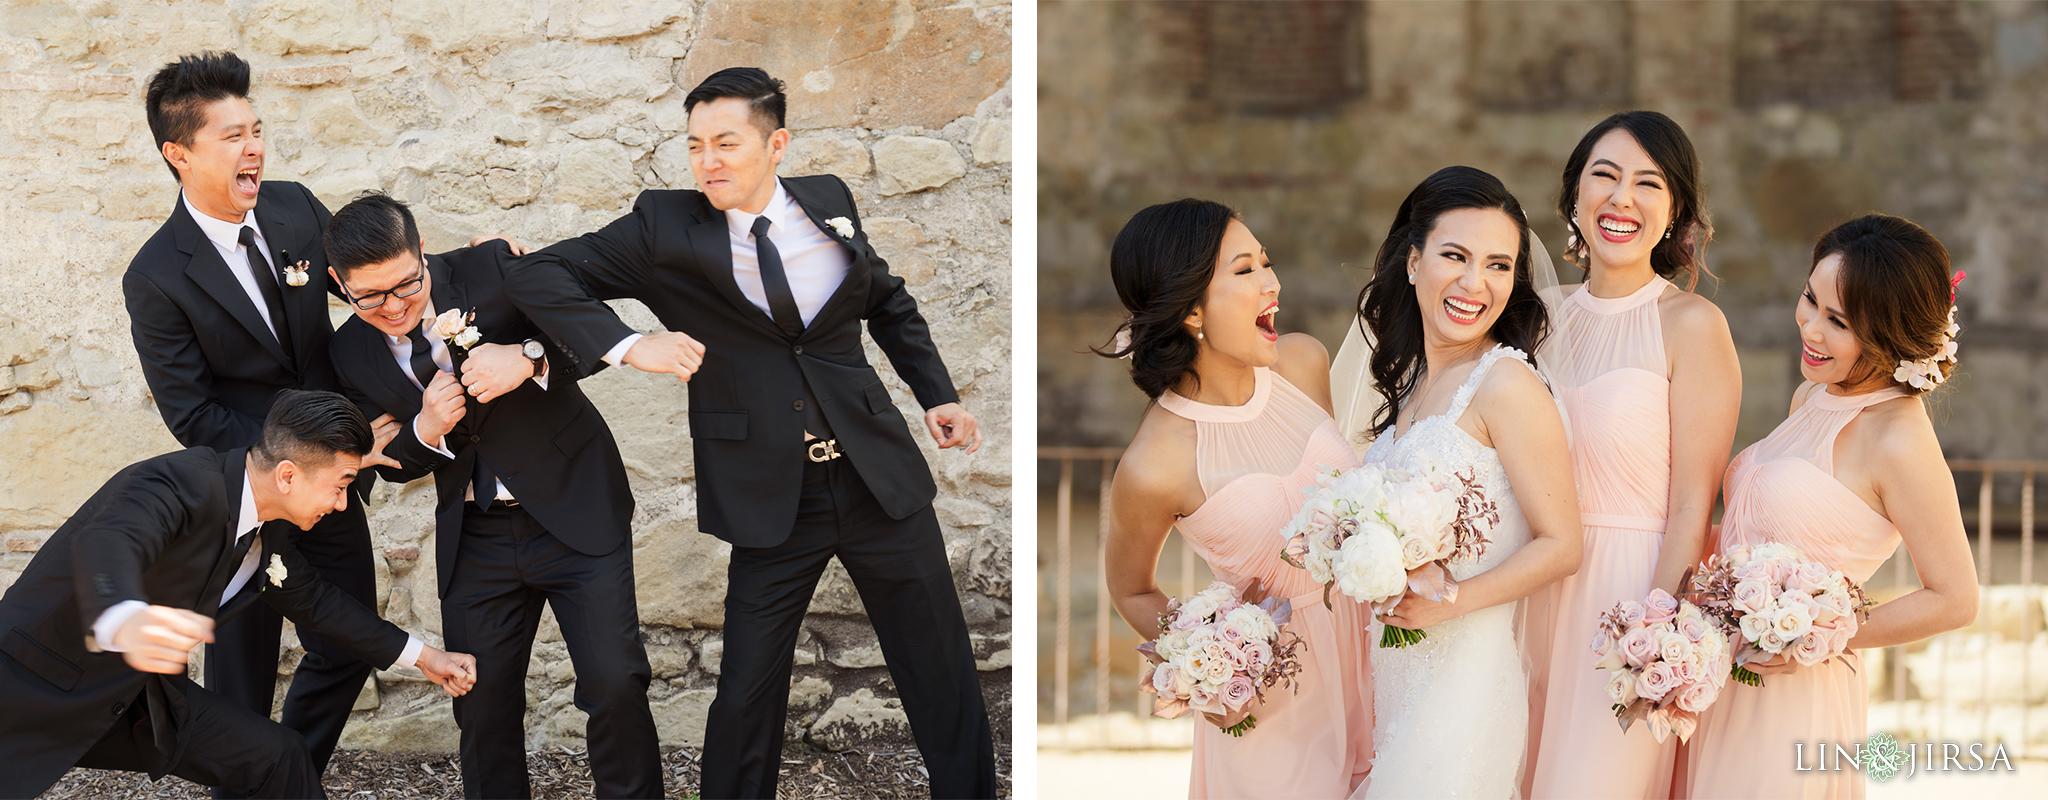 24 Mission Basilica San Juan Capistrano Wedding Photography